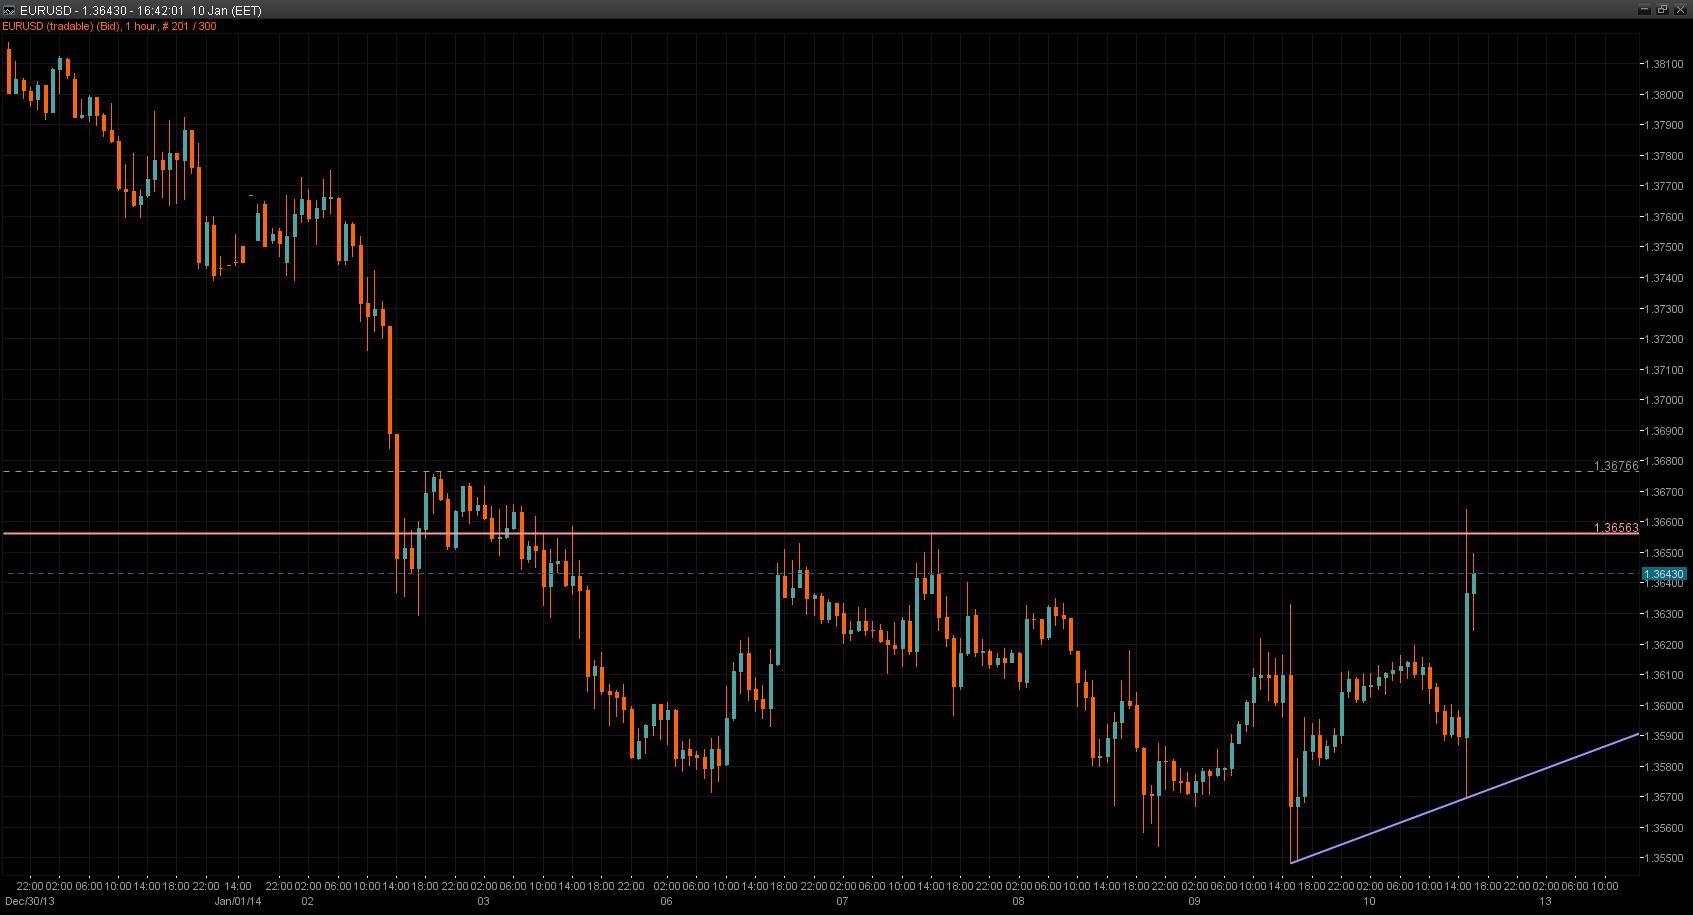 EUR/USD Chart 10 Jan 2014